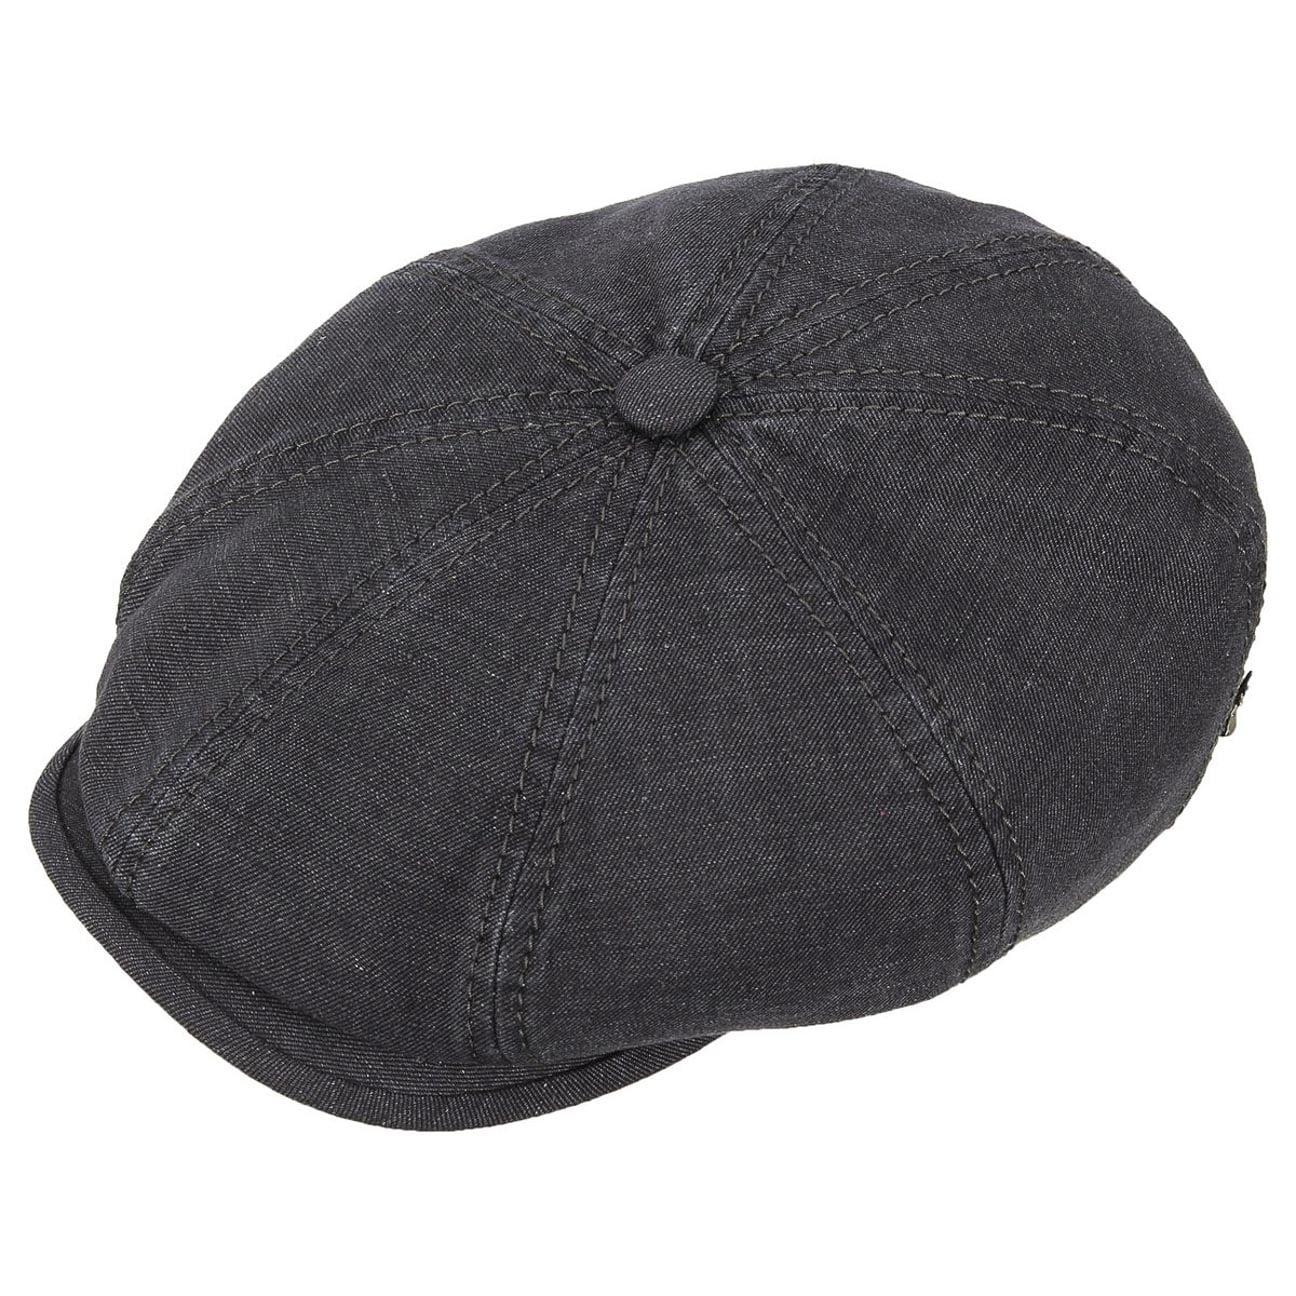 FORDSAN CP US Army Veteran Armor Mens Beanie Cap Skull Cap Winter Warm Knitting Hats.